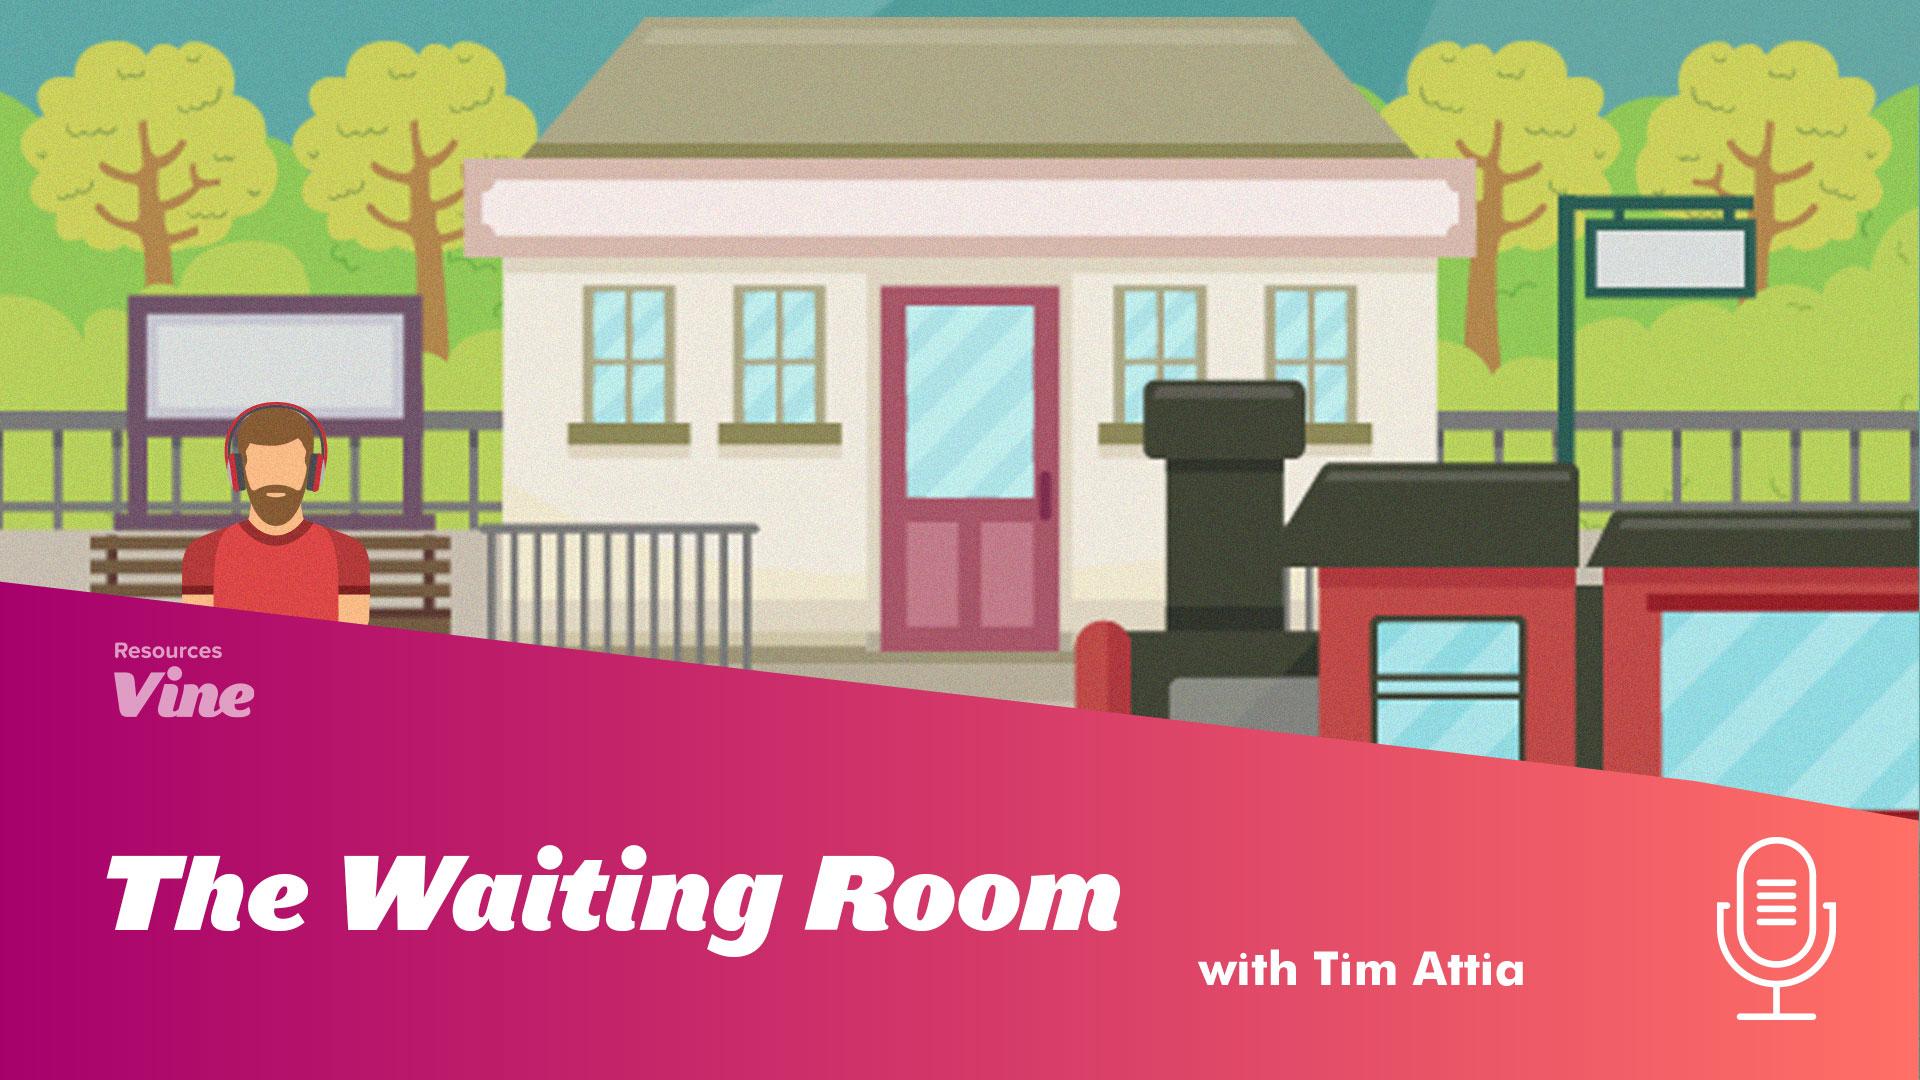 Thumbnail_The_Waiting_Room_TA